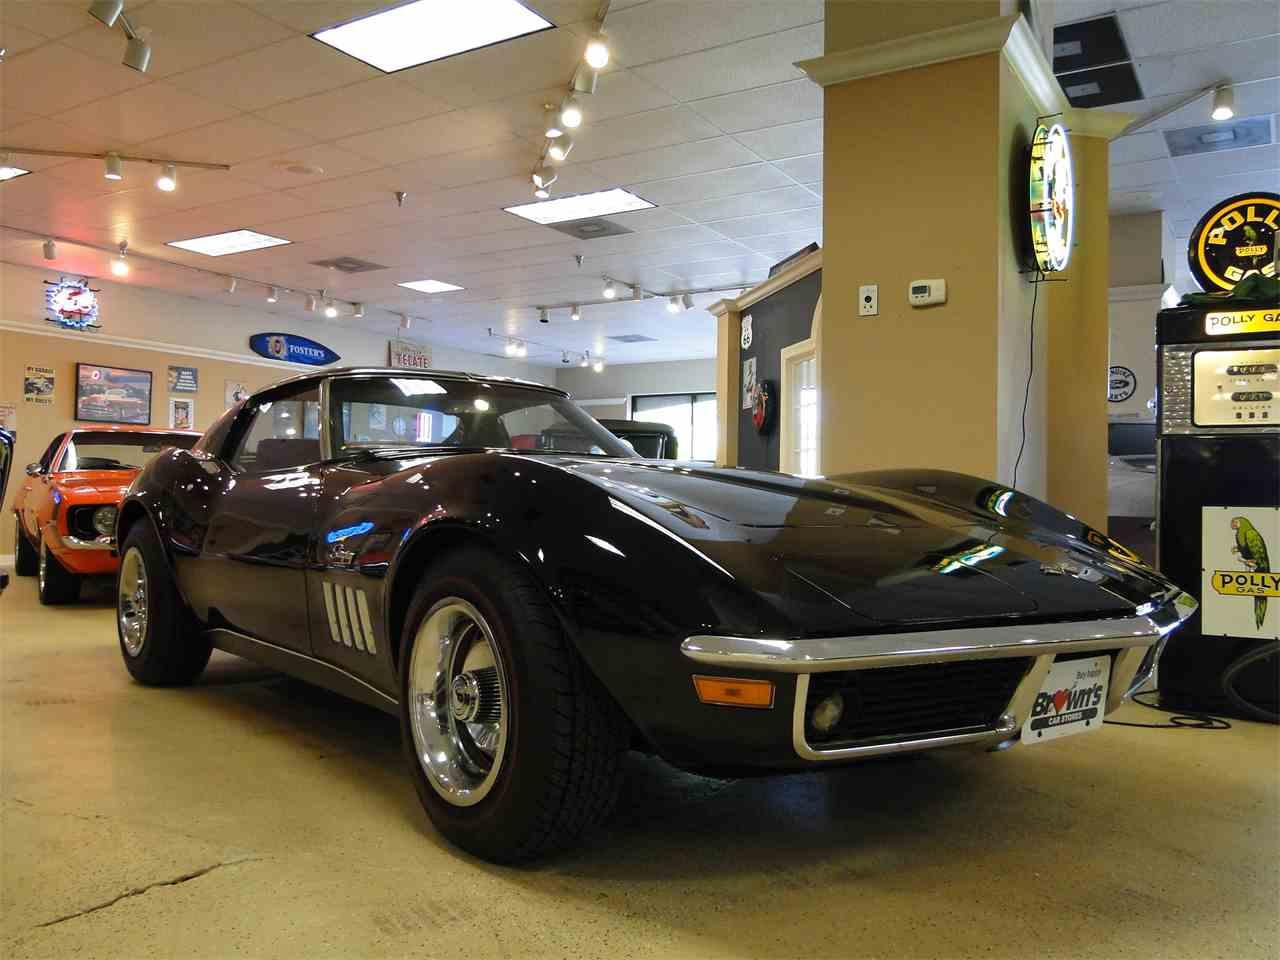 1969 Chevrolet Corvette for Sale | ClassicCars.com | CC-1008160